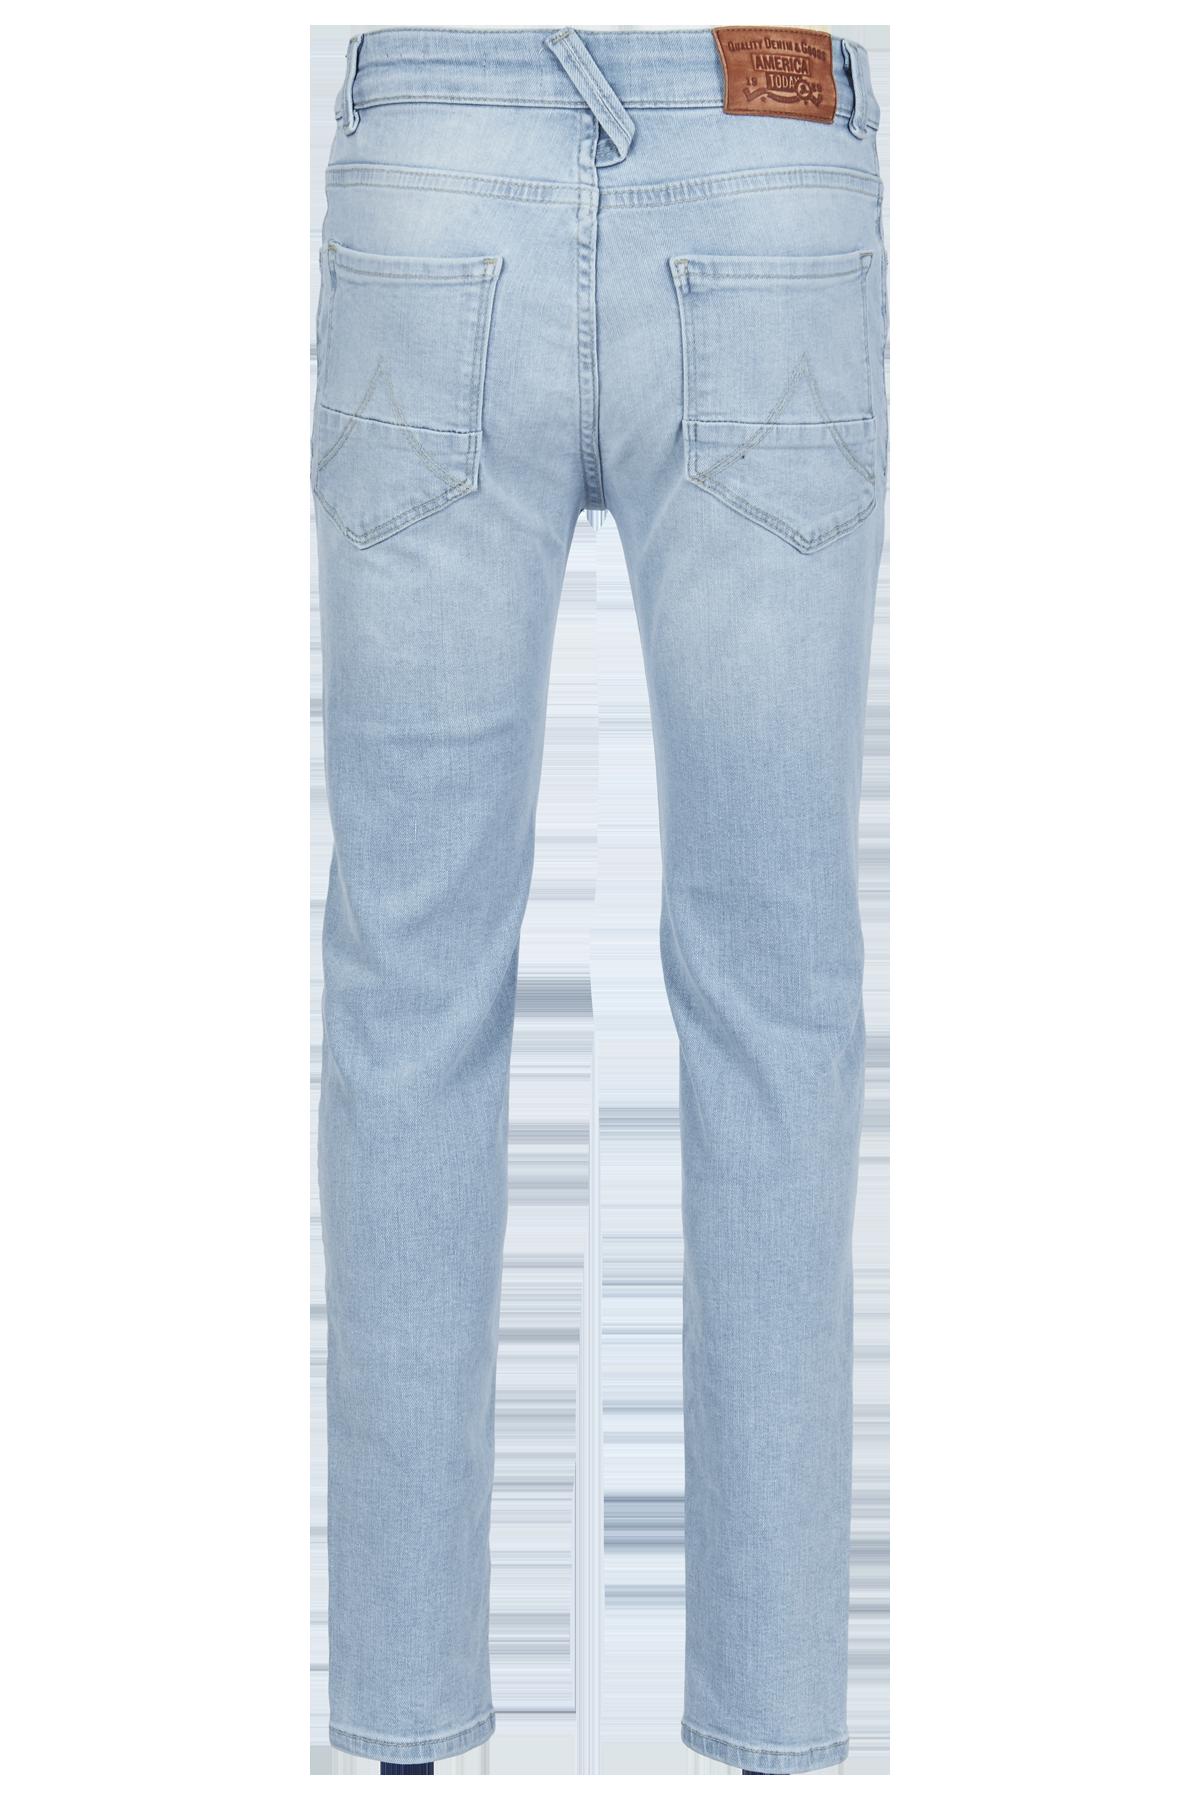 Jeans Kid Jr.